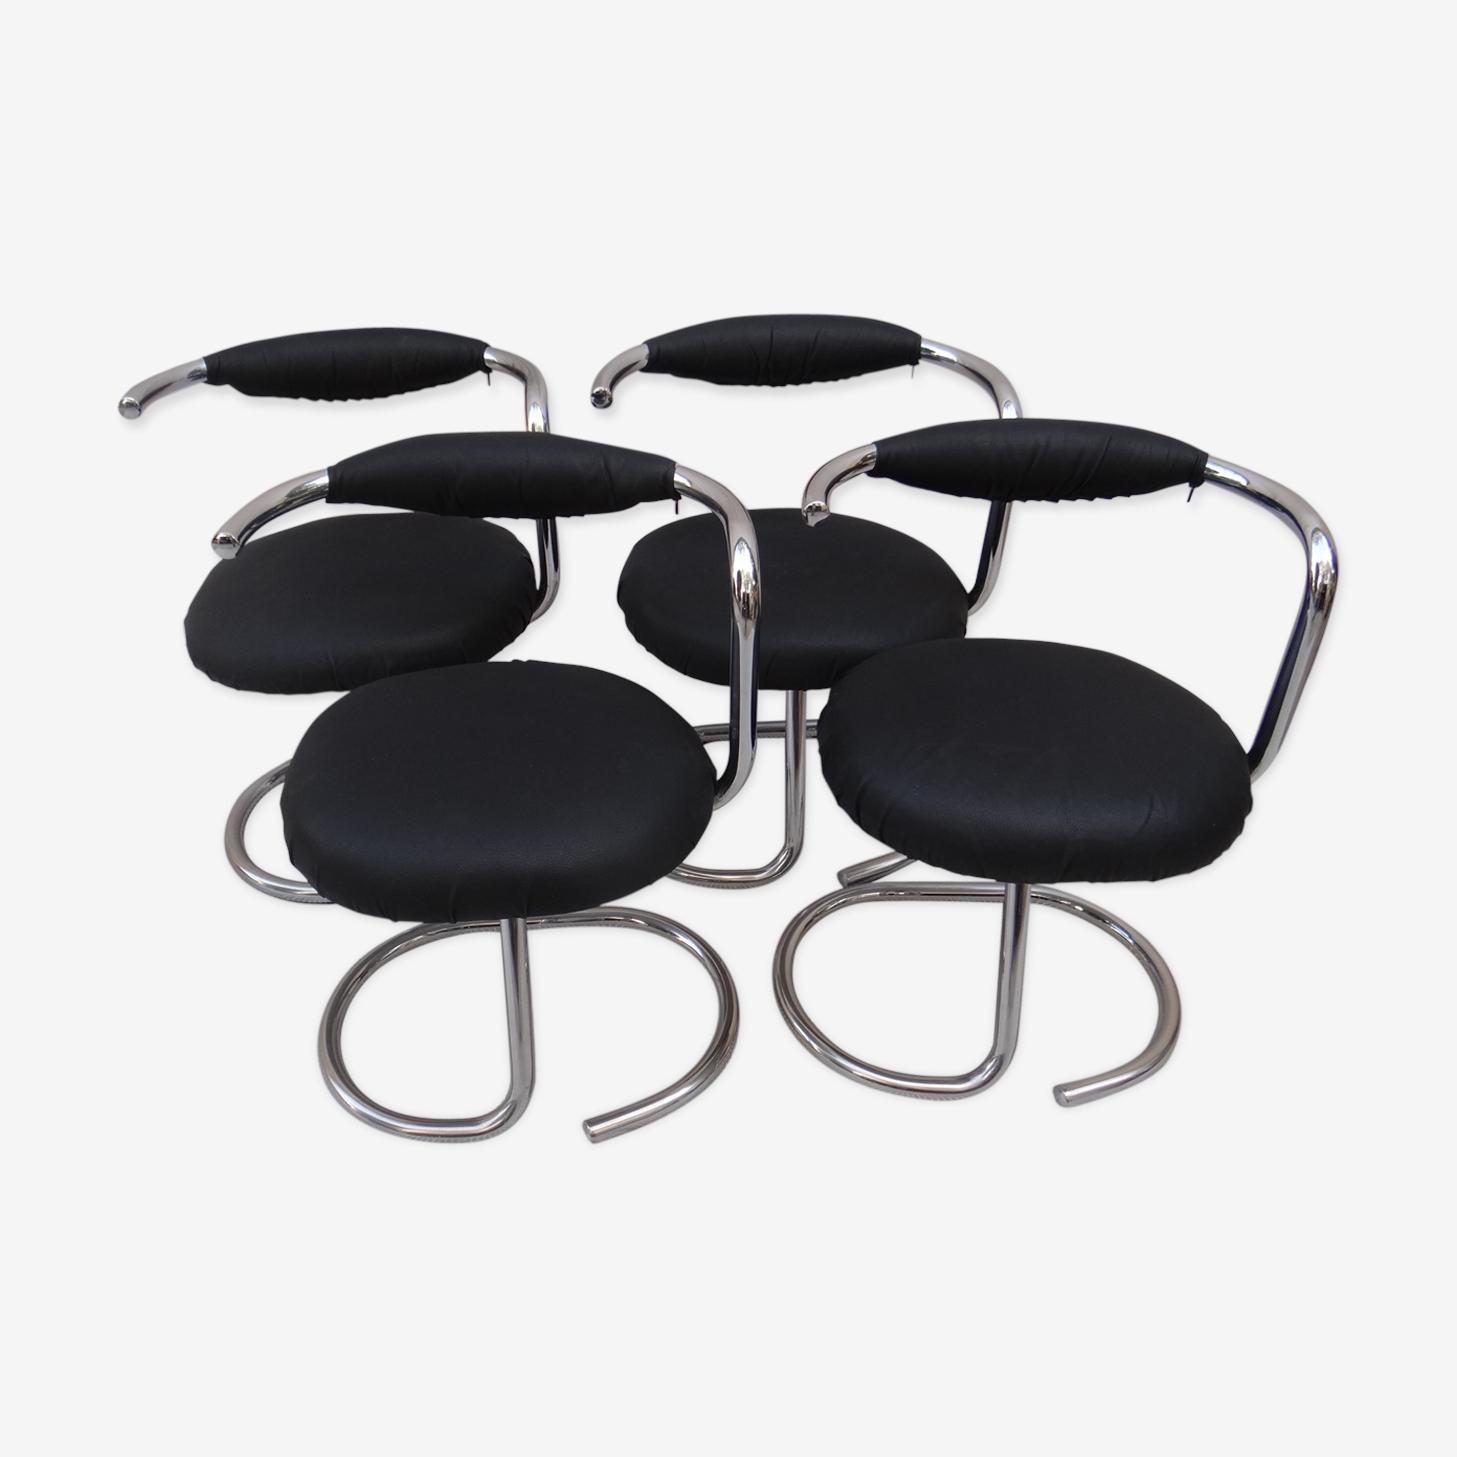 4 chairs Giorgo Stoppino 1970